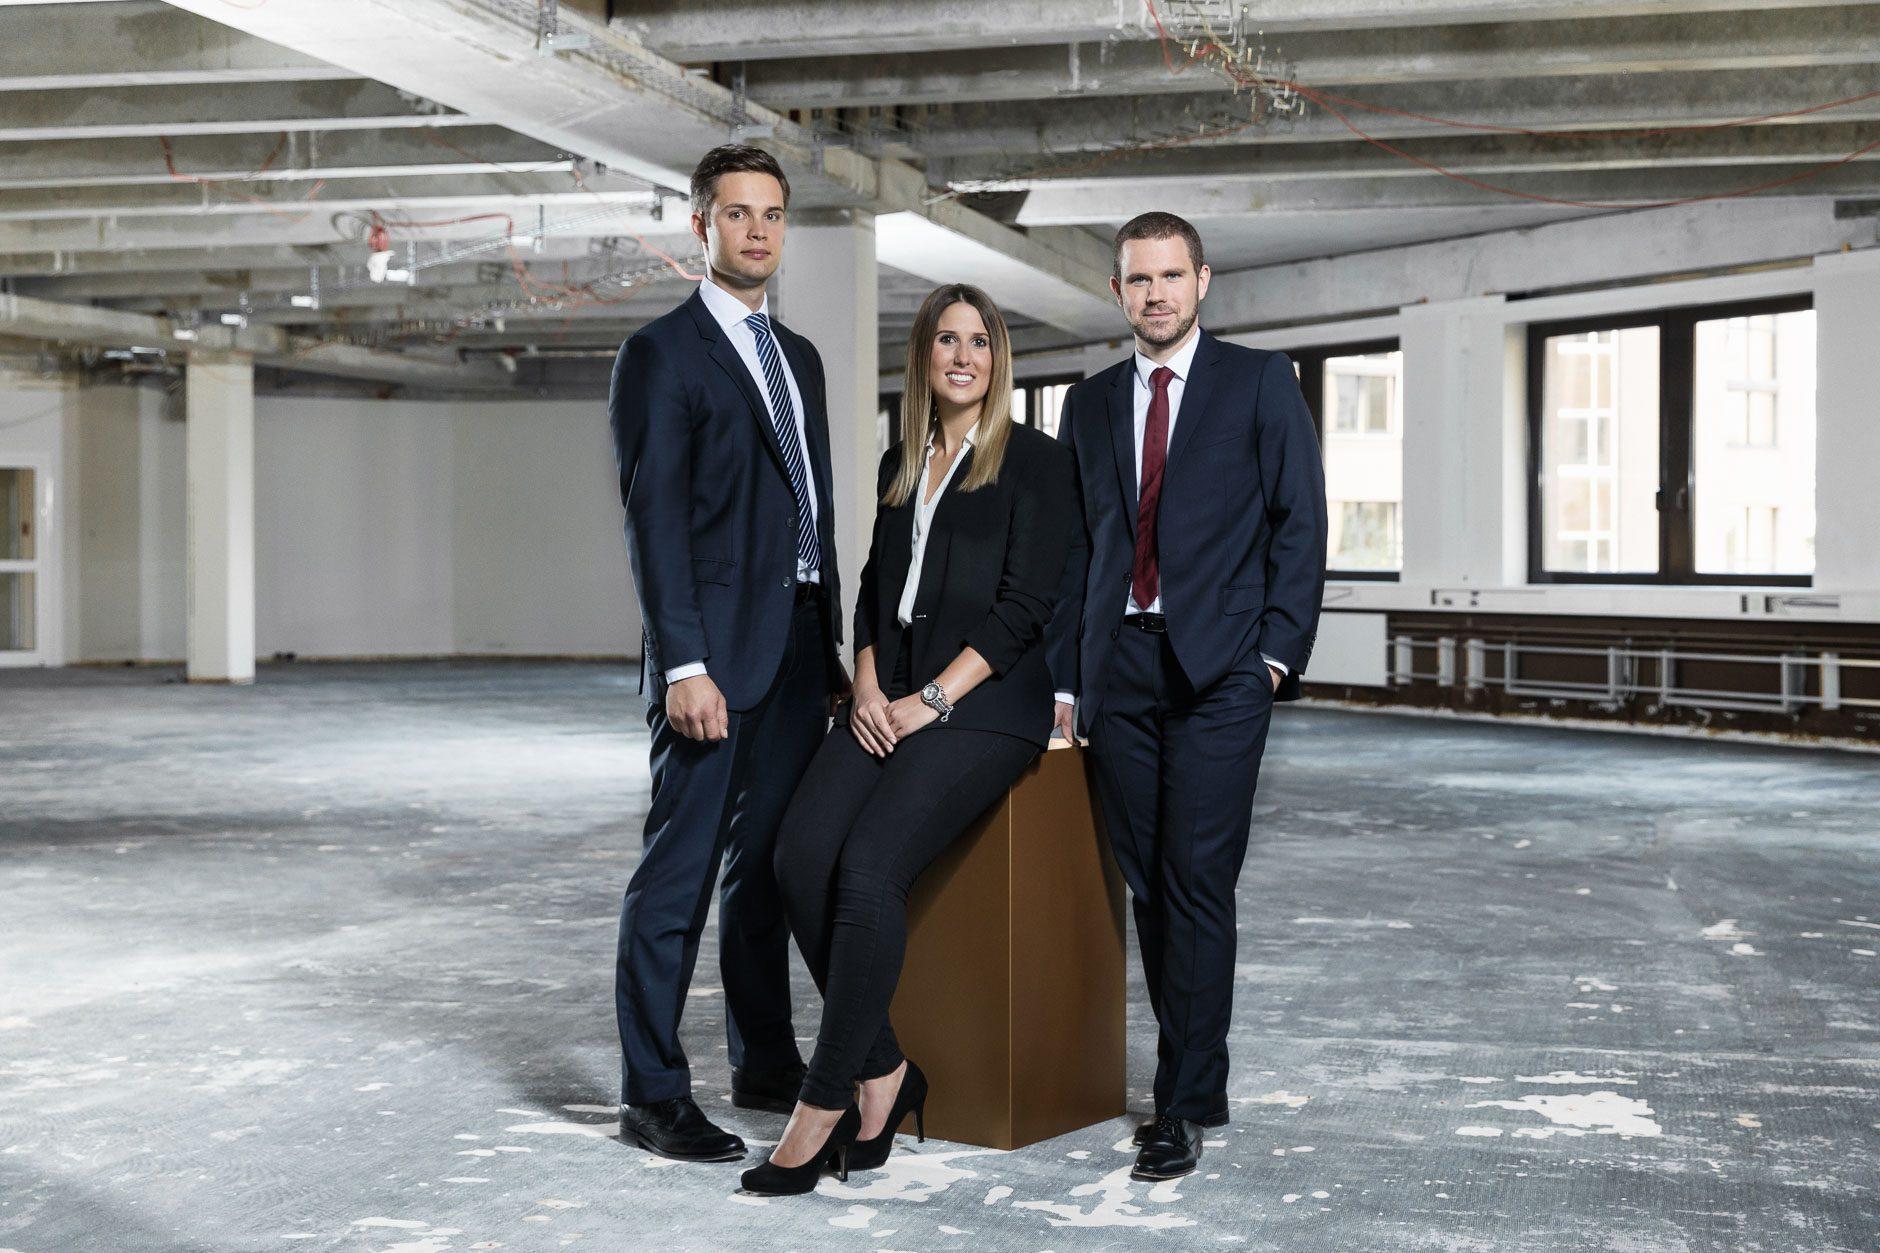 Gruppenfoto CILON - Crafted Real Estate Management, Frankfurt am Main